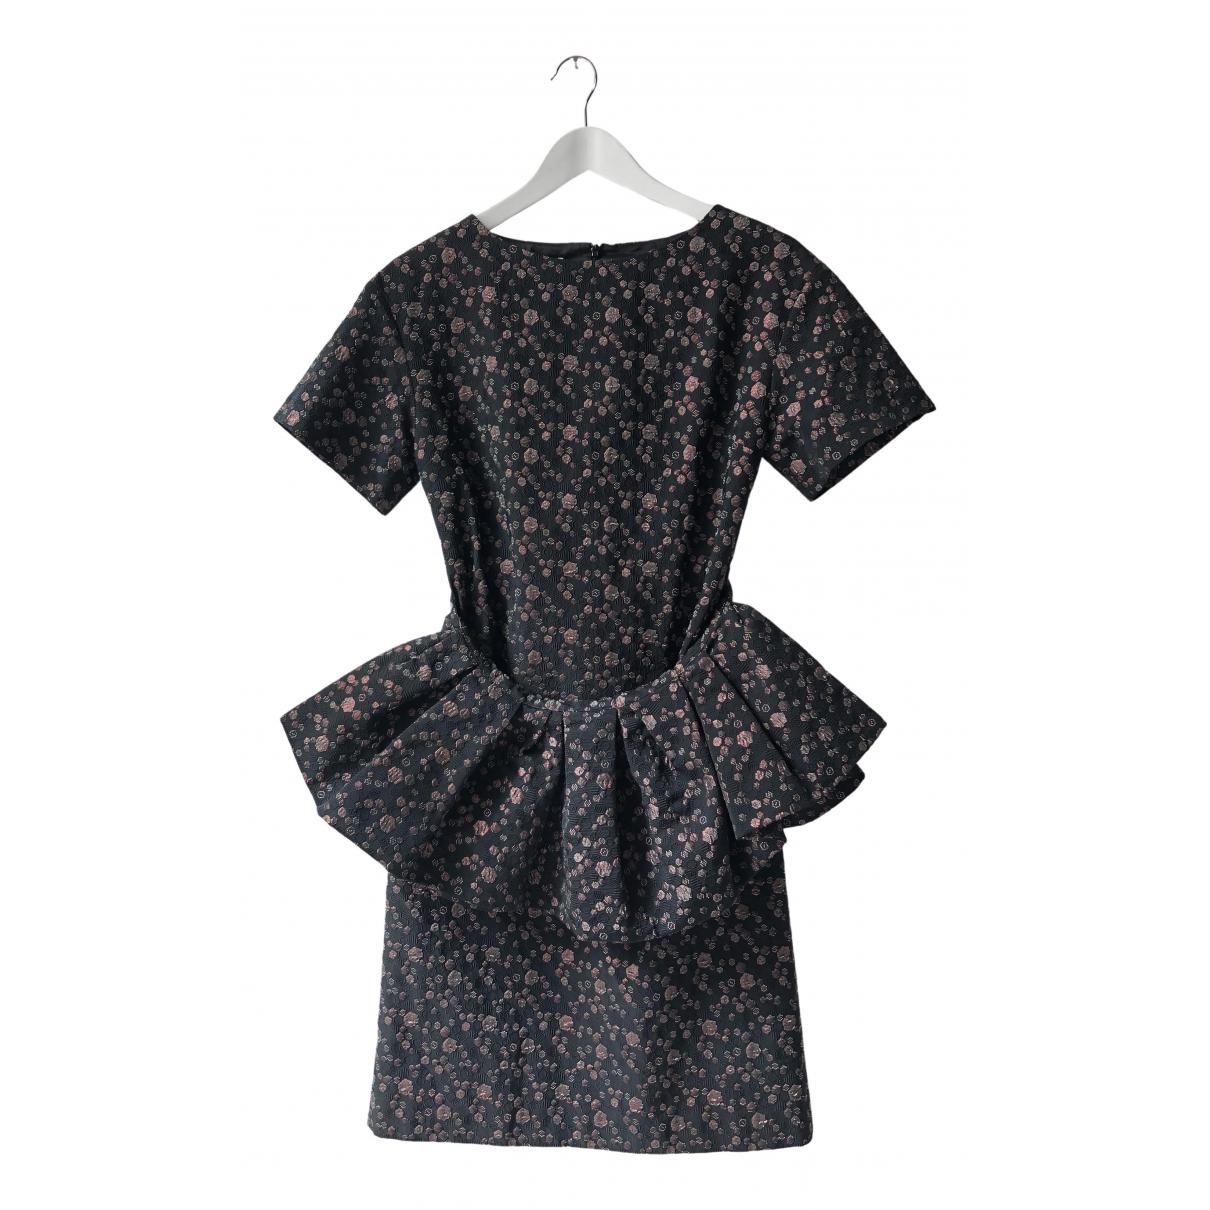 Dries Van Noten \N dress for Women 36 FR